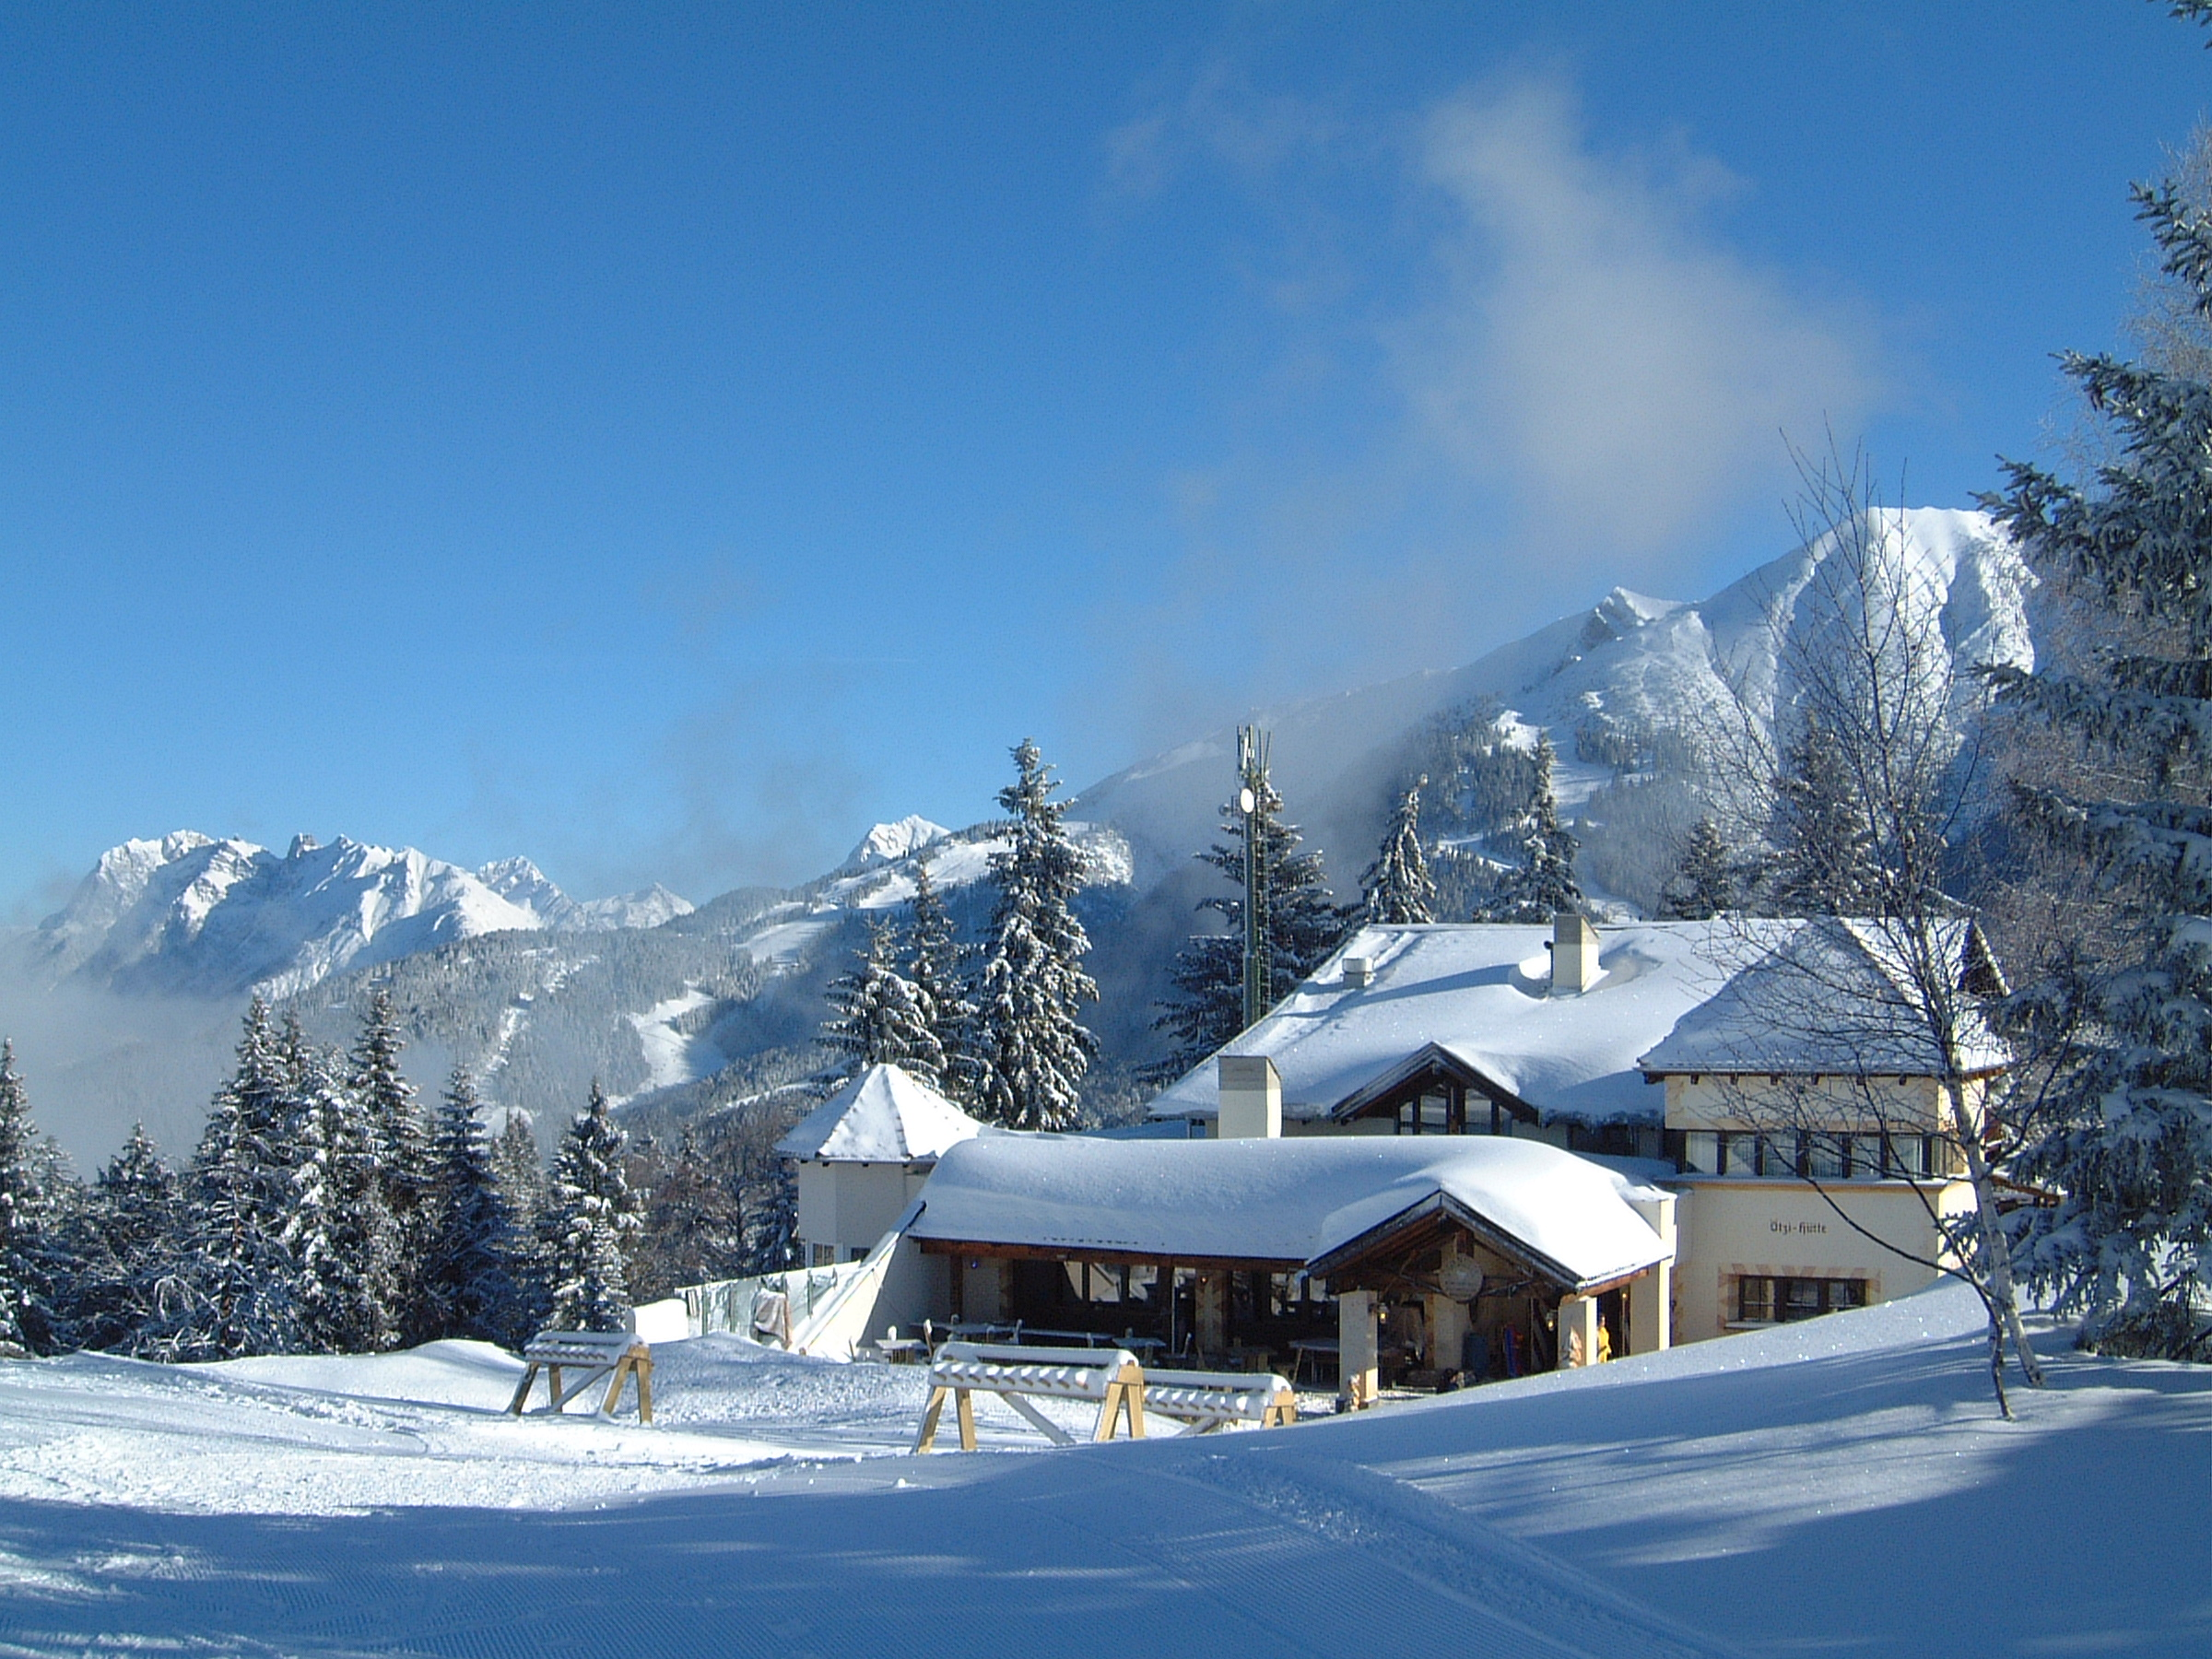 Seefeld Οδηγός Χιονοδρομικού Κέντρου